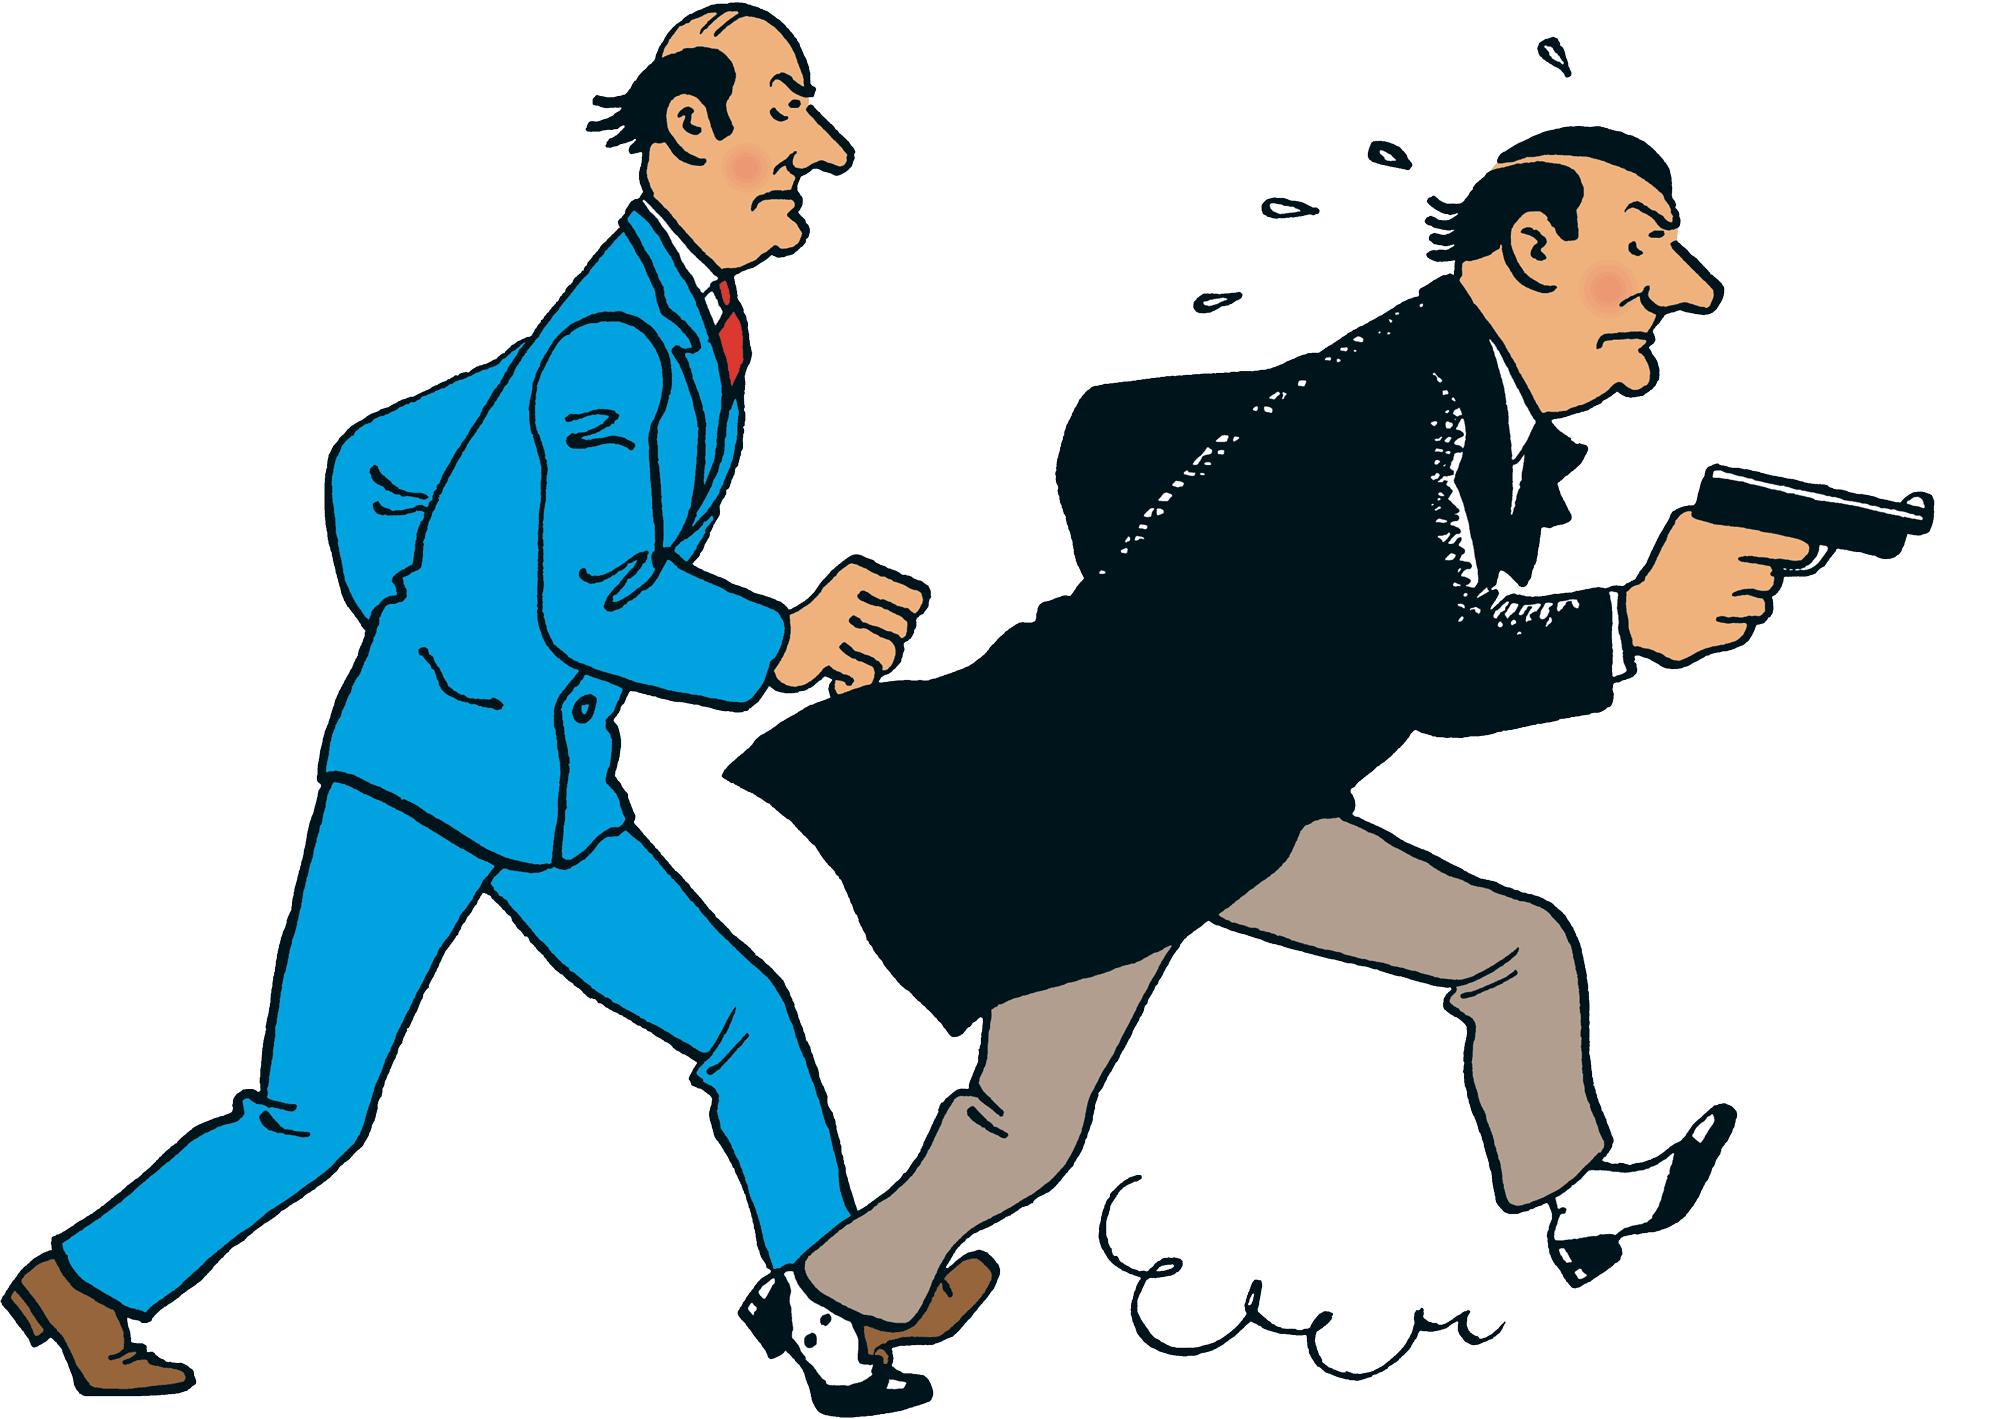 Tintin - Les Aventures de Tintin - Les Frères Loiseau